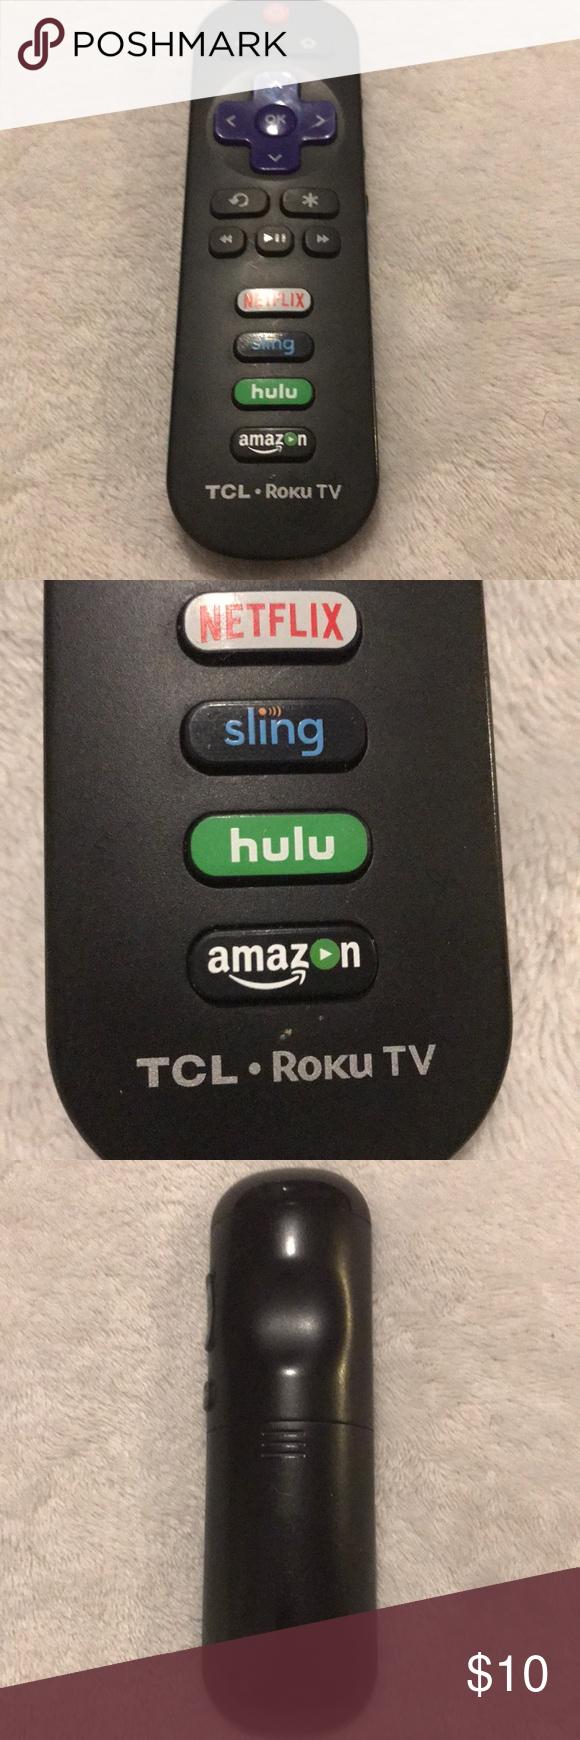 Sharp TCL Roku Smart TV Remote (With images) Roku, Smart